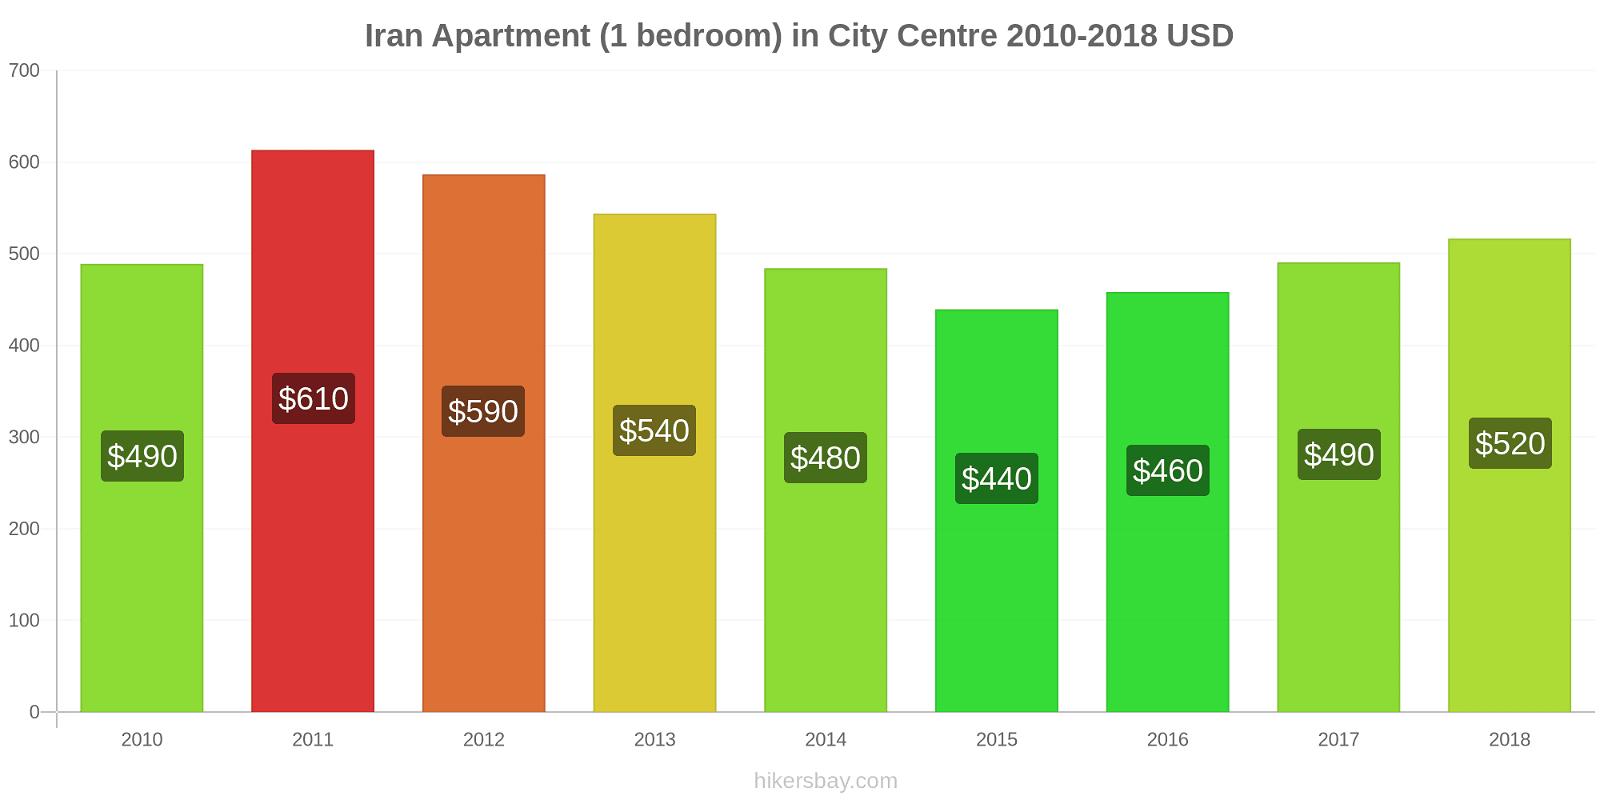 Iran price changes Apartment (1 bedroom) in City Centre hikersbay.com